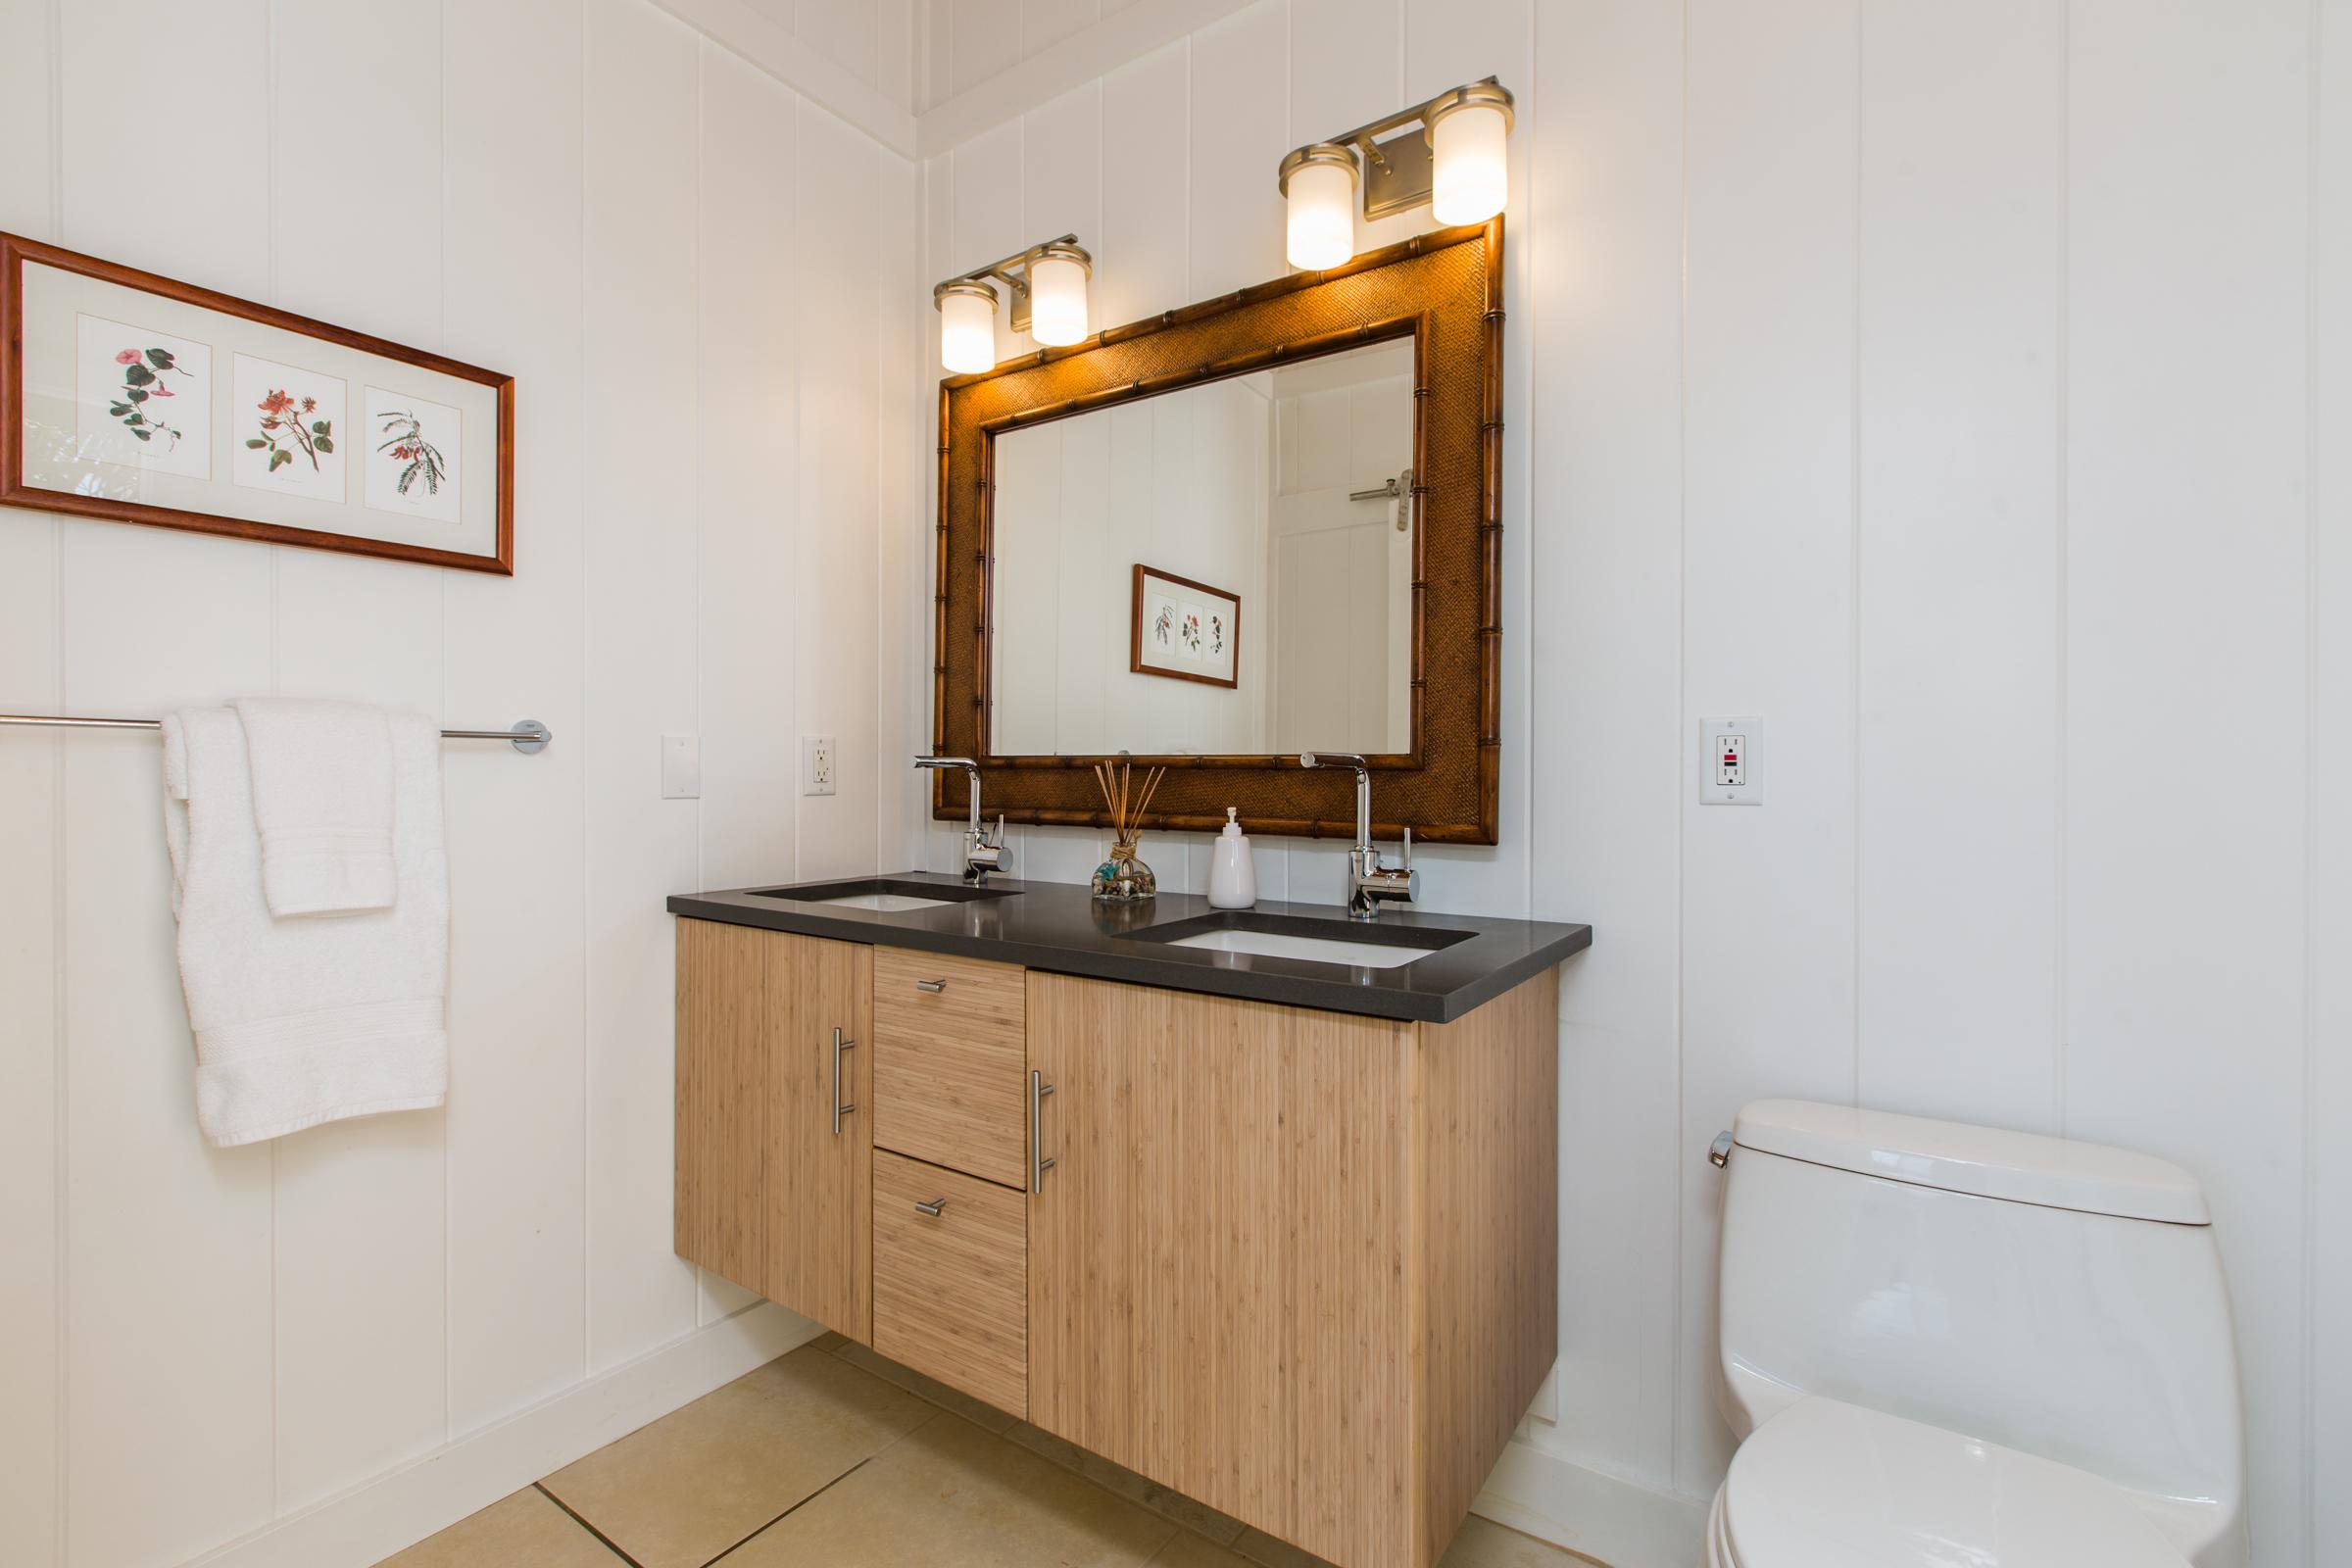 2nd-Bathroom.jpg_high_2194177.jpg